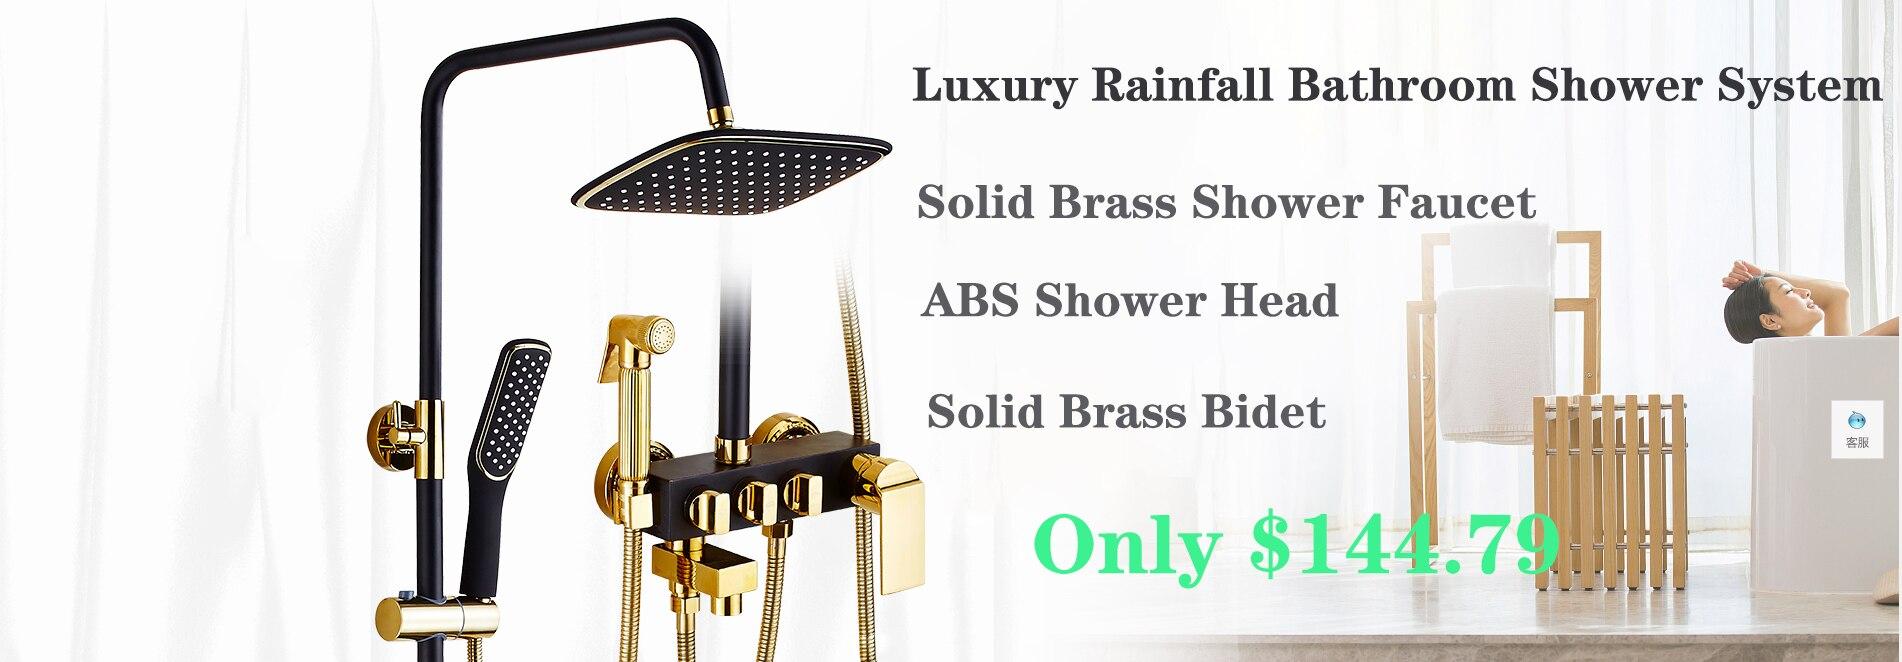 H34fd6de3b8a24dc5a497743a6c69ba31S Shower Set SDSN White Gold Bathroom Shower System Quality Copper Brass Bathtub Faucet Rainfall Shower Head Spa Bath Shower Sets